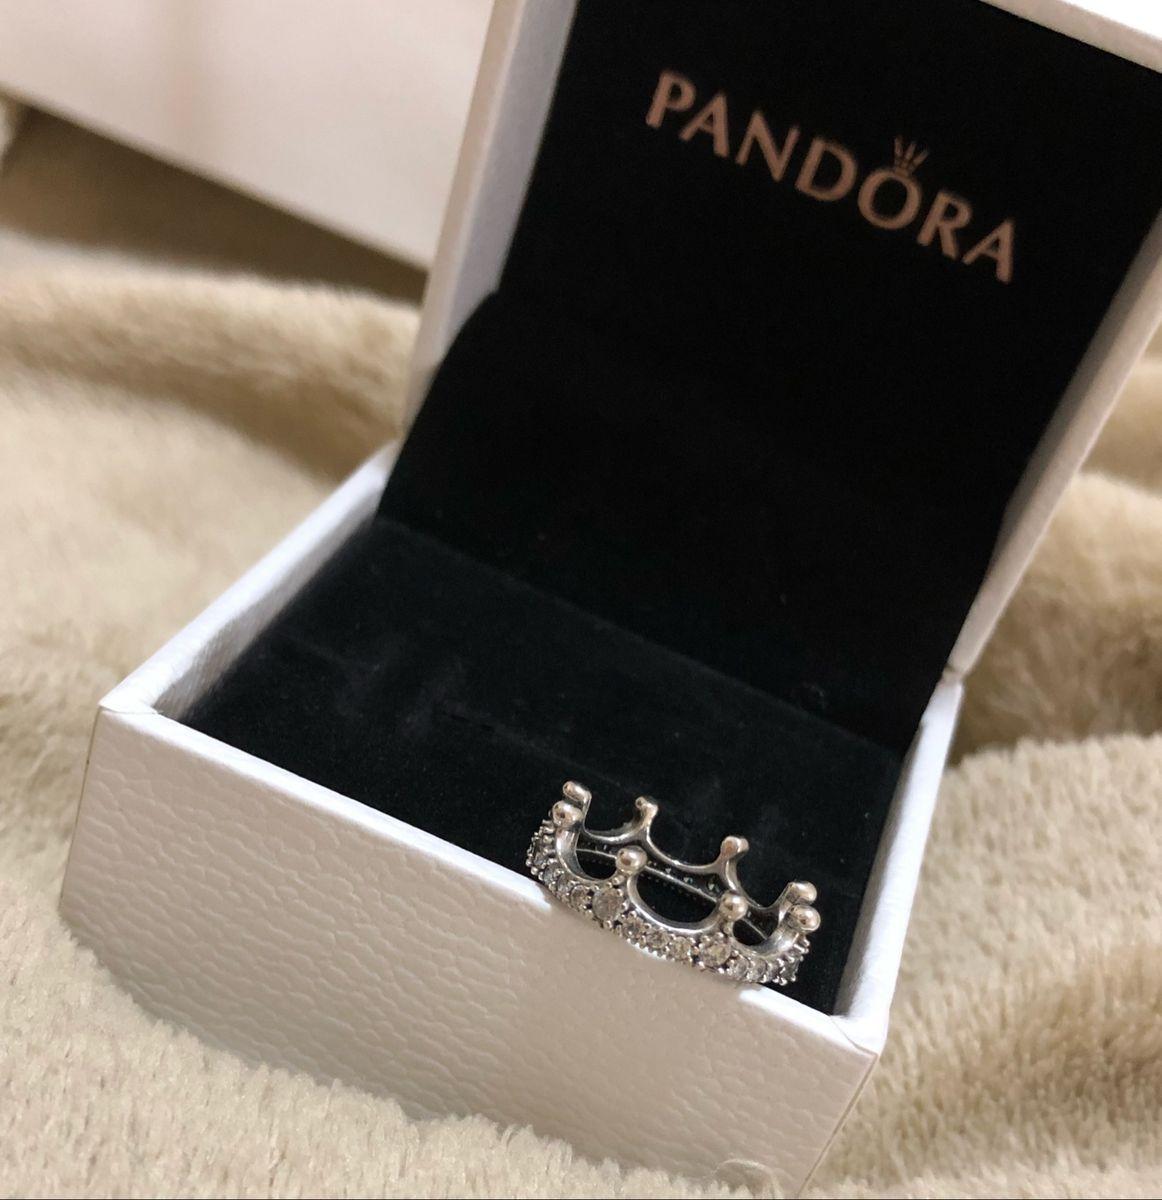 anel pandora falange - jóias pandora